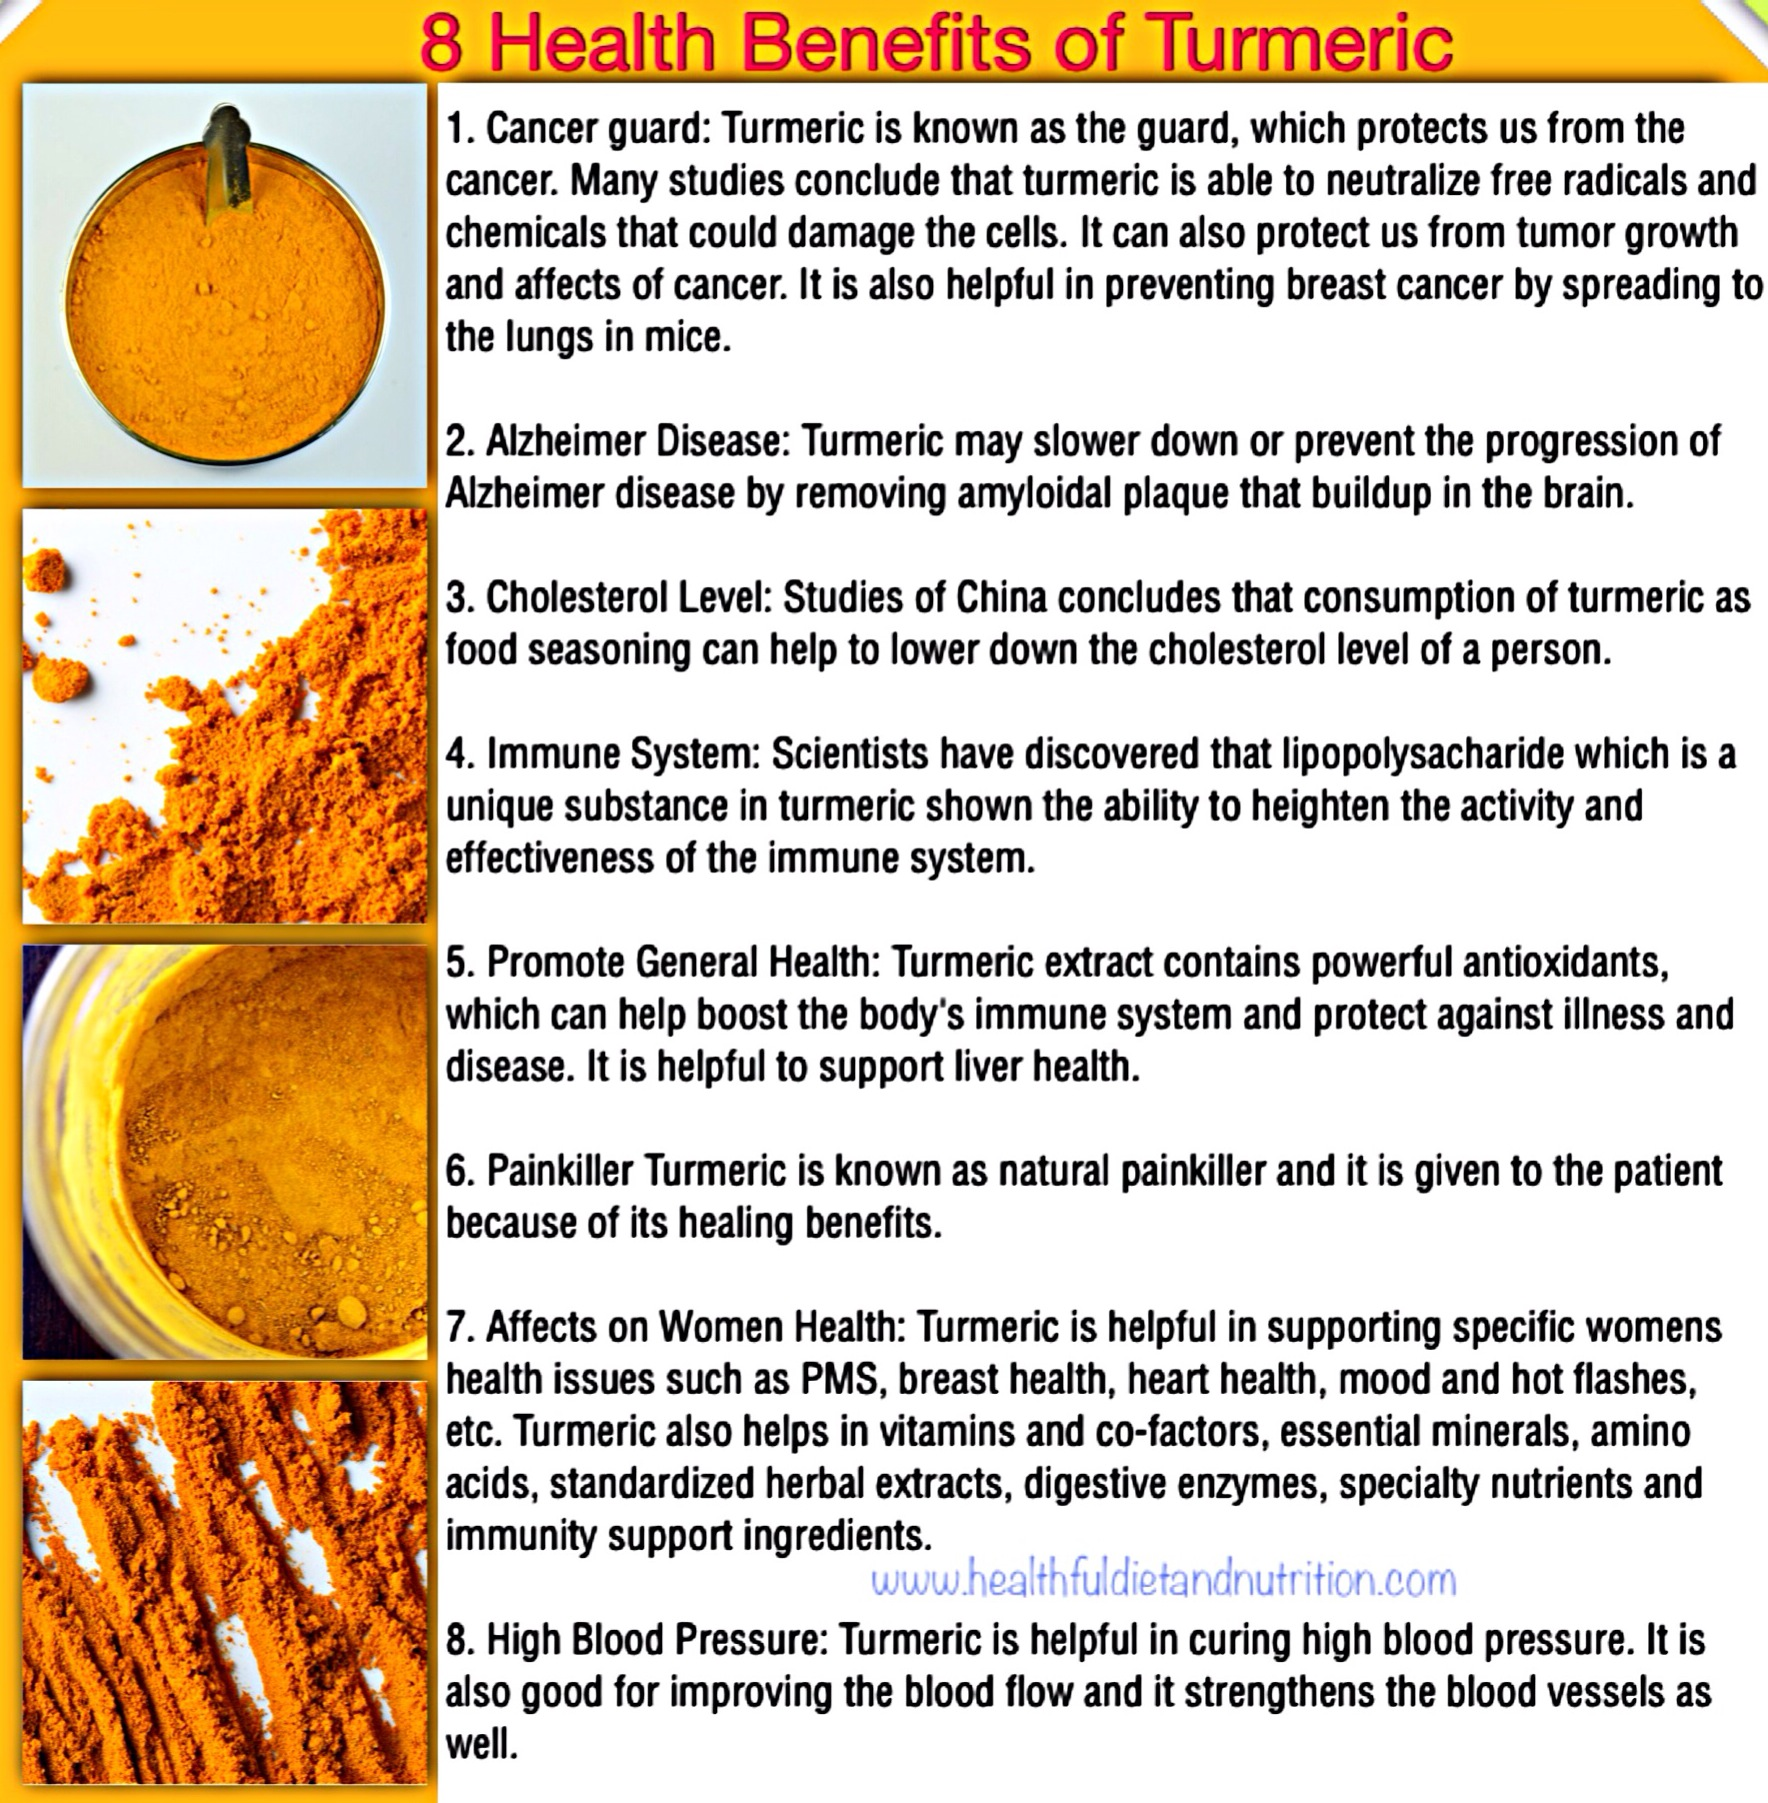 8 Benefits of Turmeric